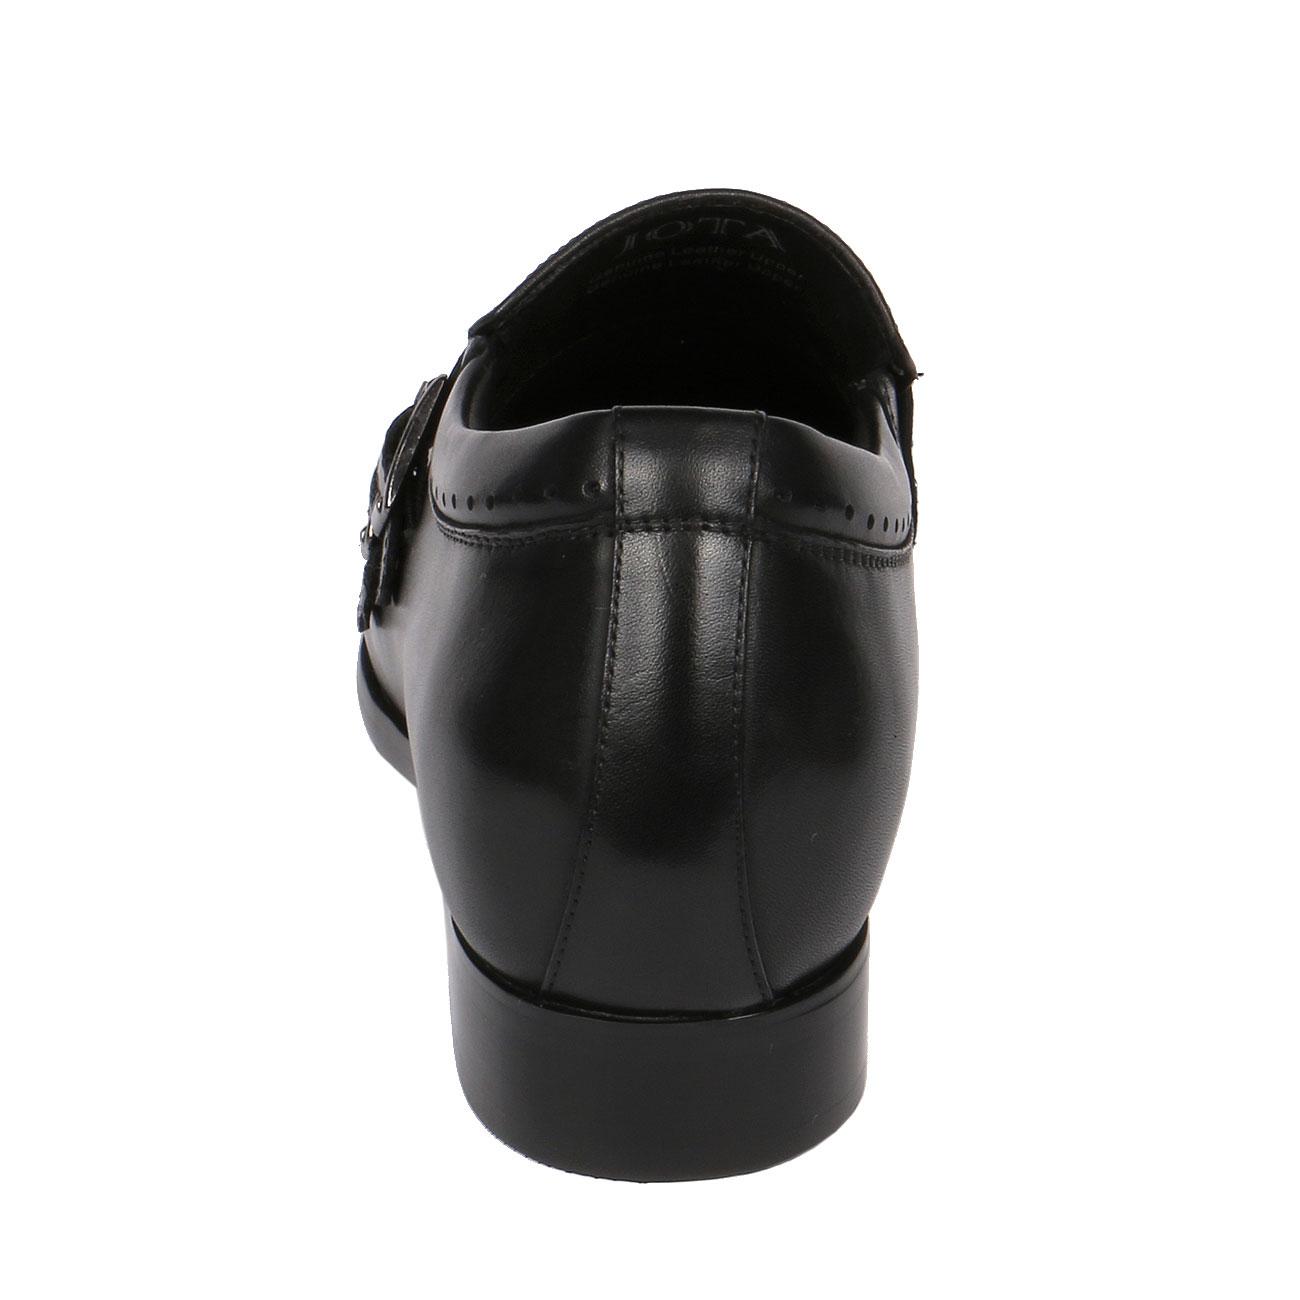 Men's Regal High Heel Leather Monk Strap Dress Shoe 2.8